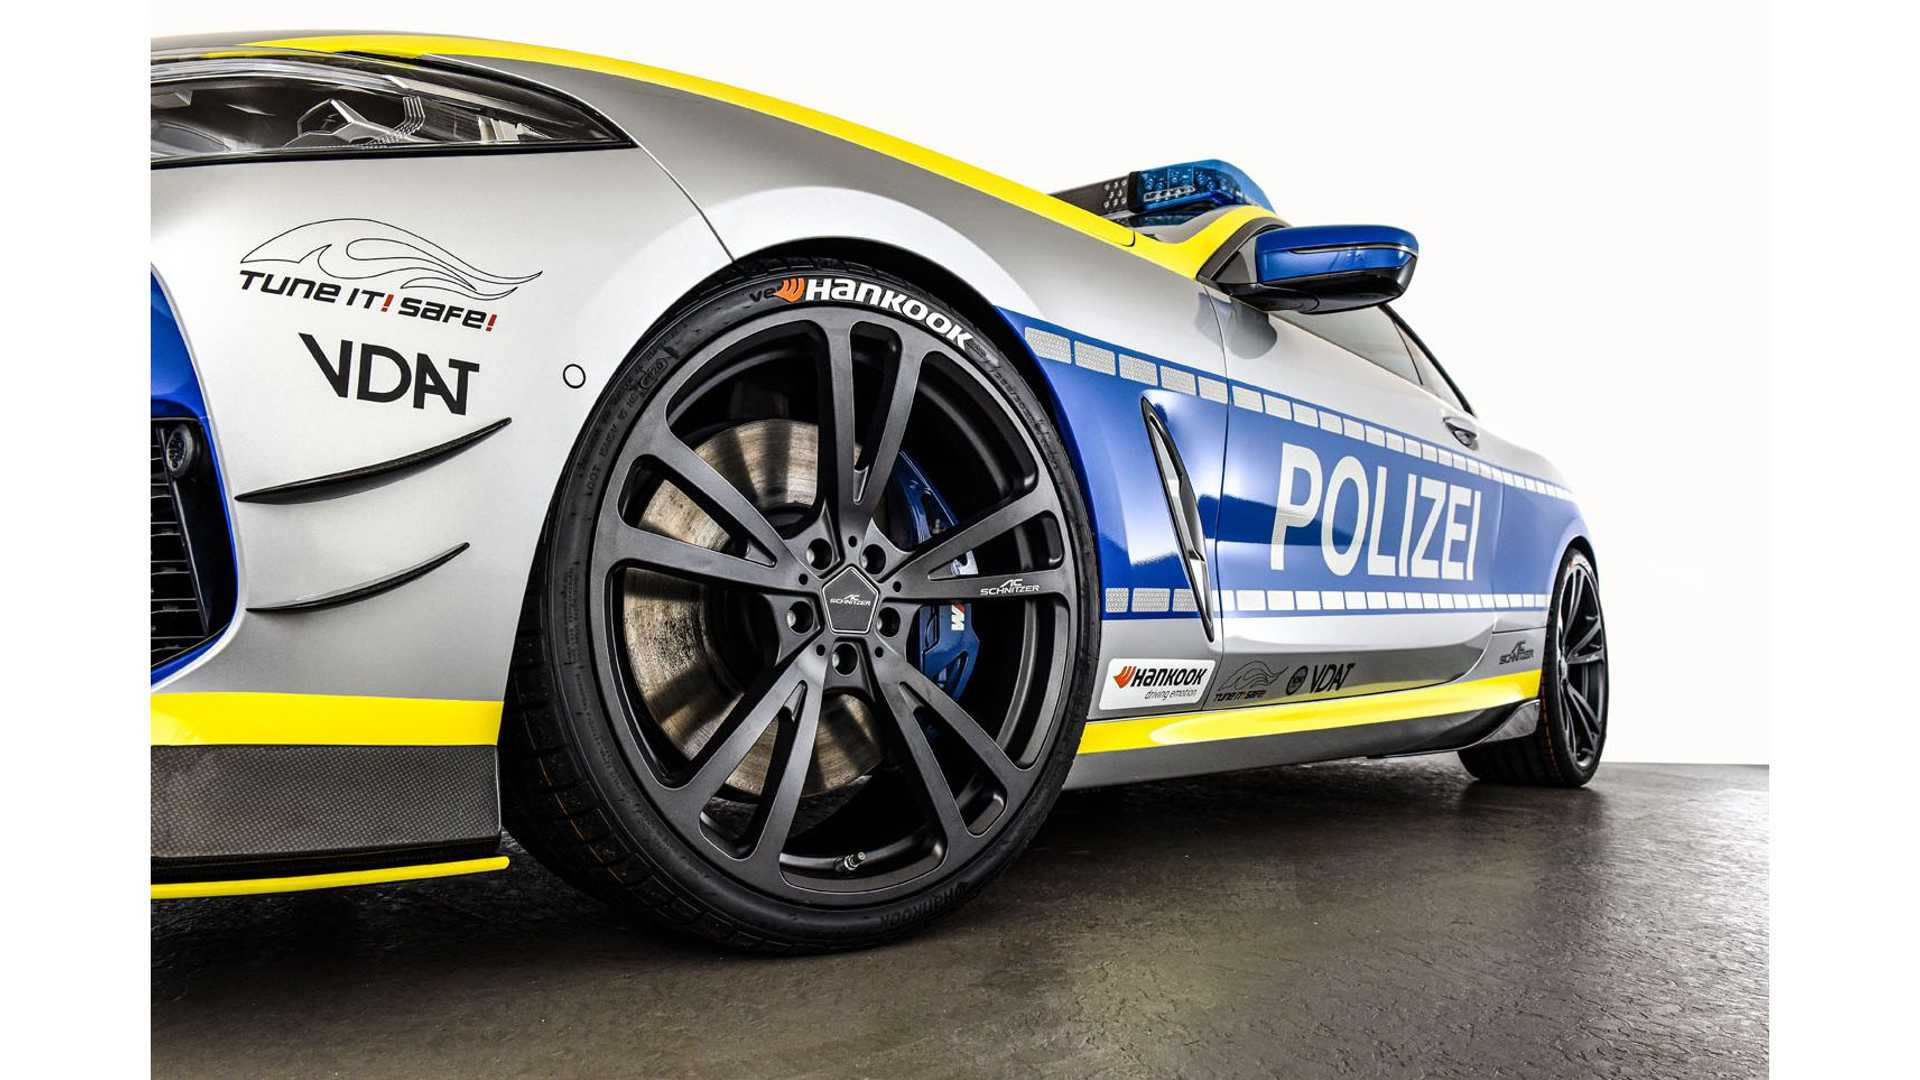 BMW-M850i-police-car-tune-it-safe-35